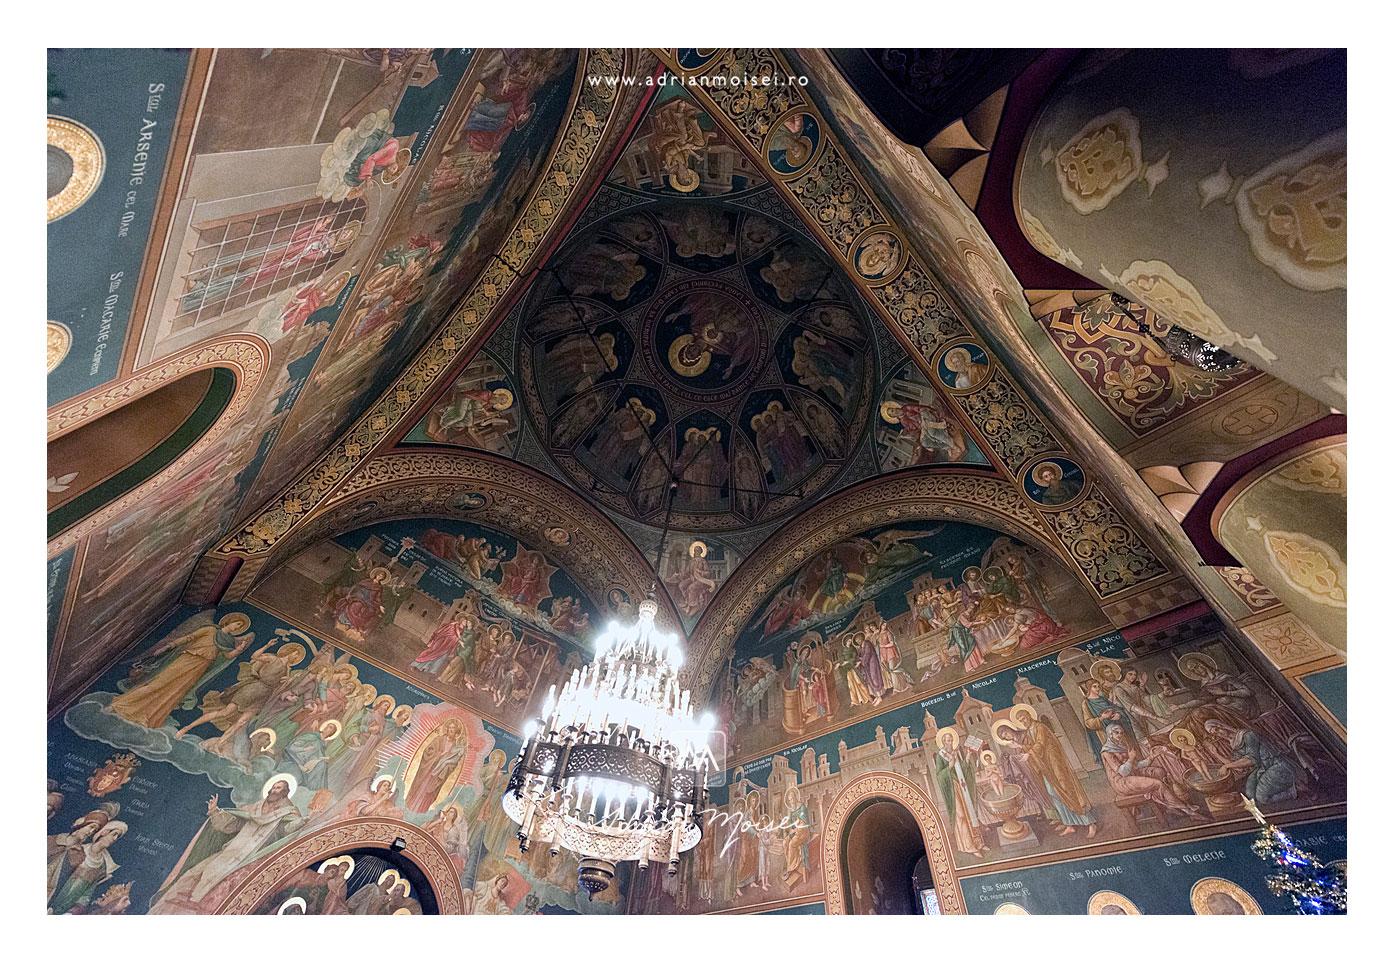 Biserica Sfântul Nicolae Domnesc Iasi, interior ultrawide de Adrian Moisei